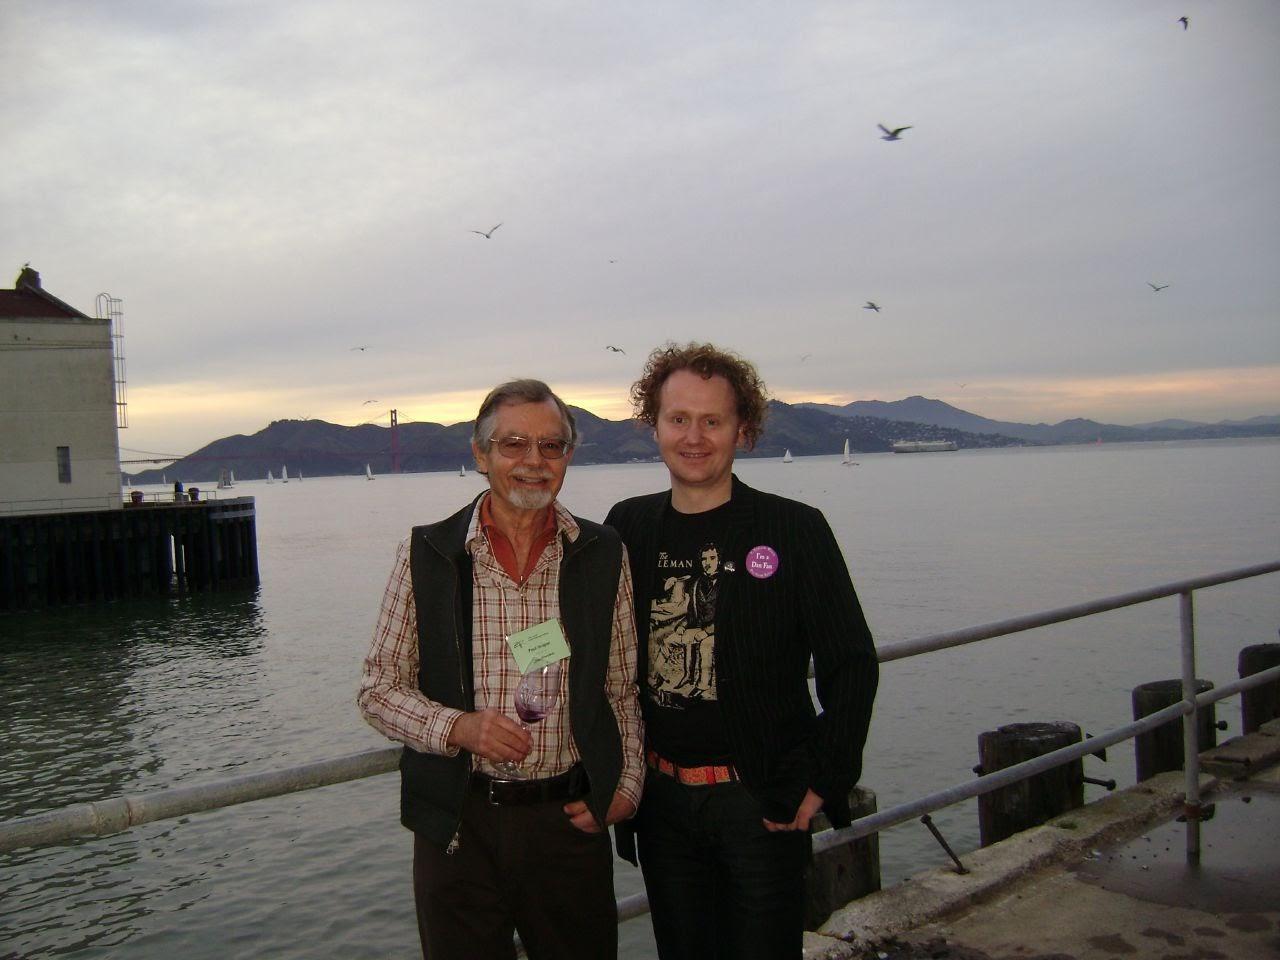 GFR's Jamie Drummond with the legendary Paul Draper of Ridge Vineyards.